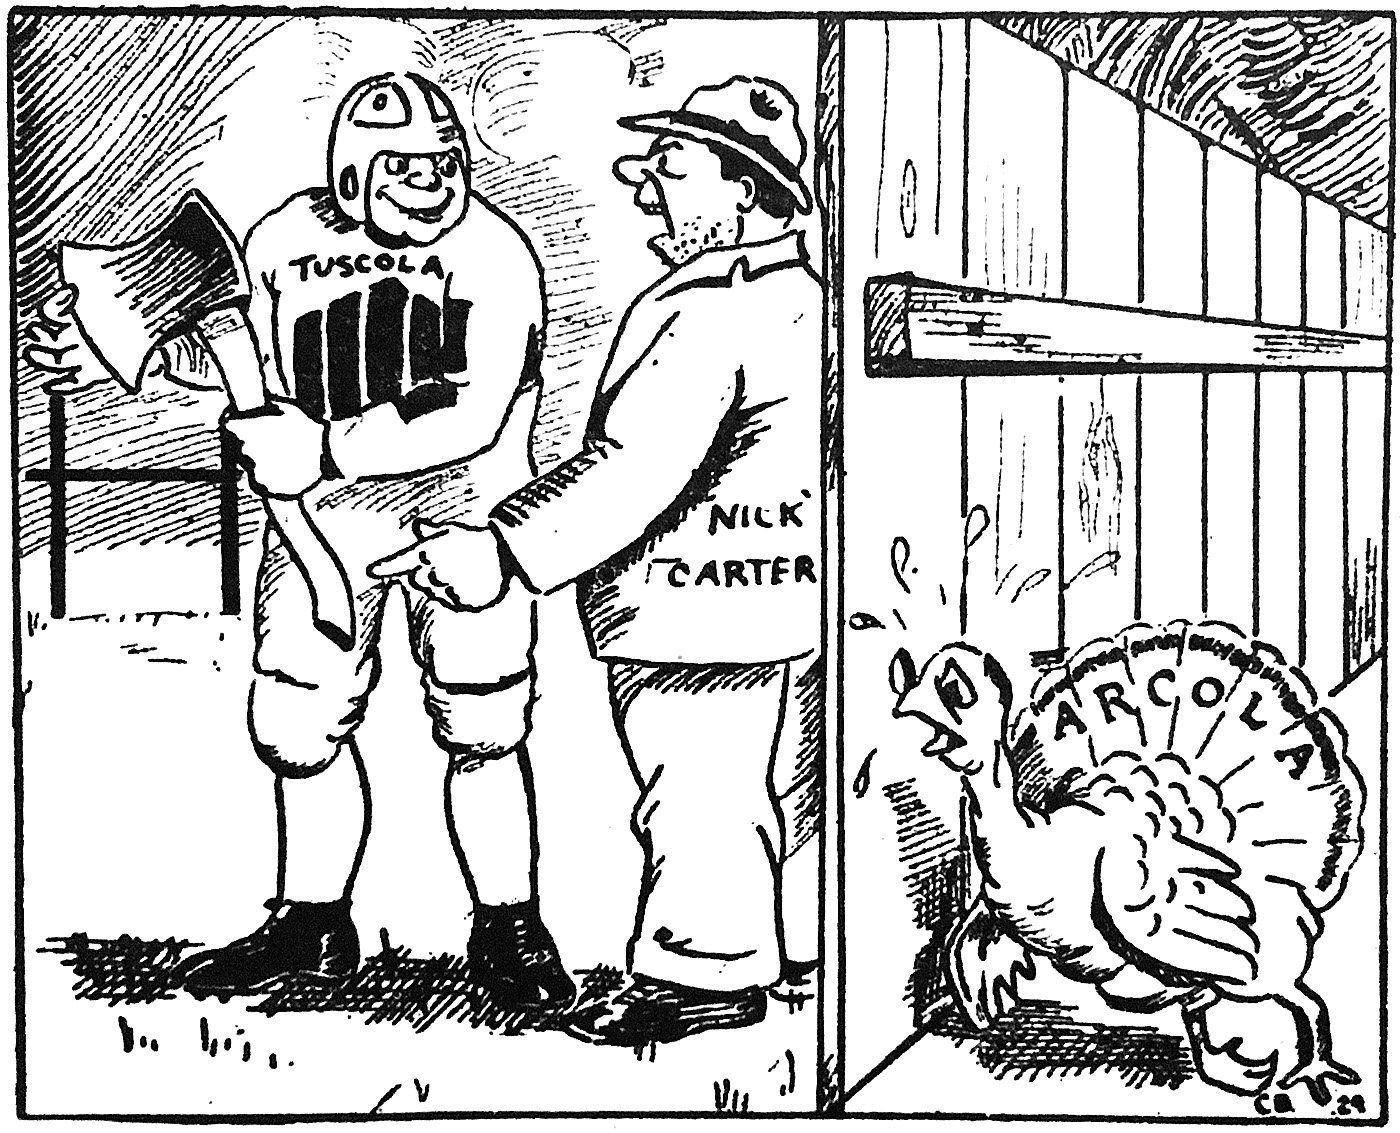 bicentennial storied high school football rivalry the cola wars English Past Present bicentennial cola wars 2